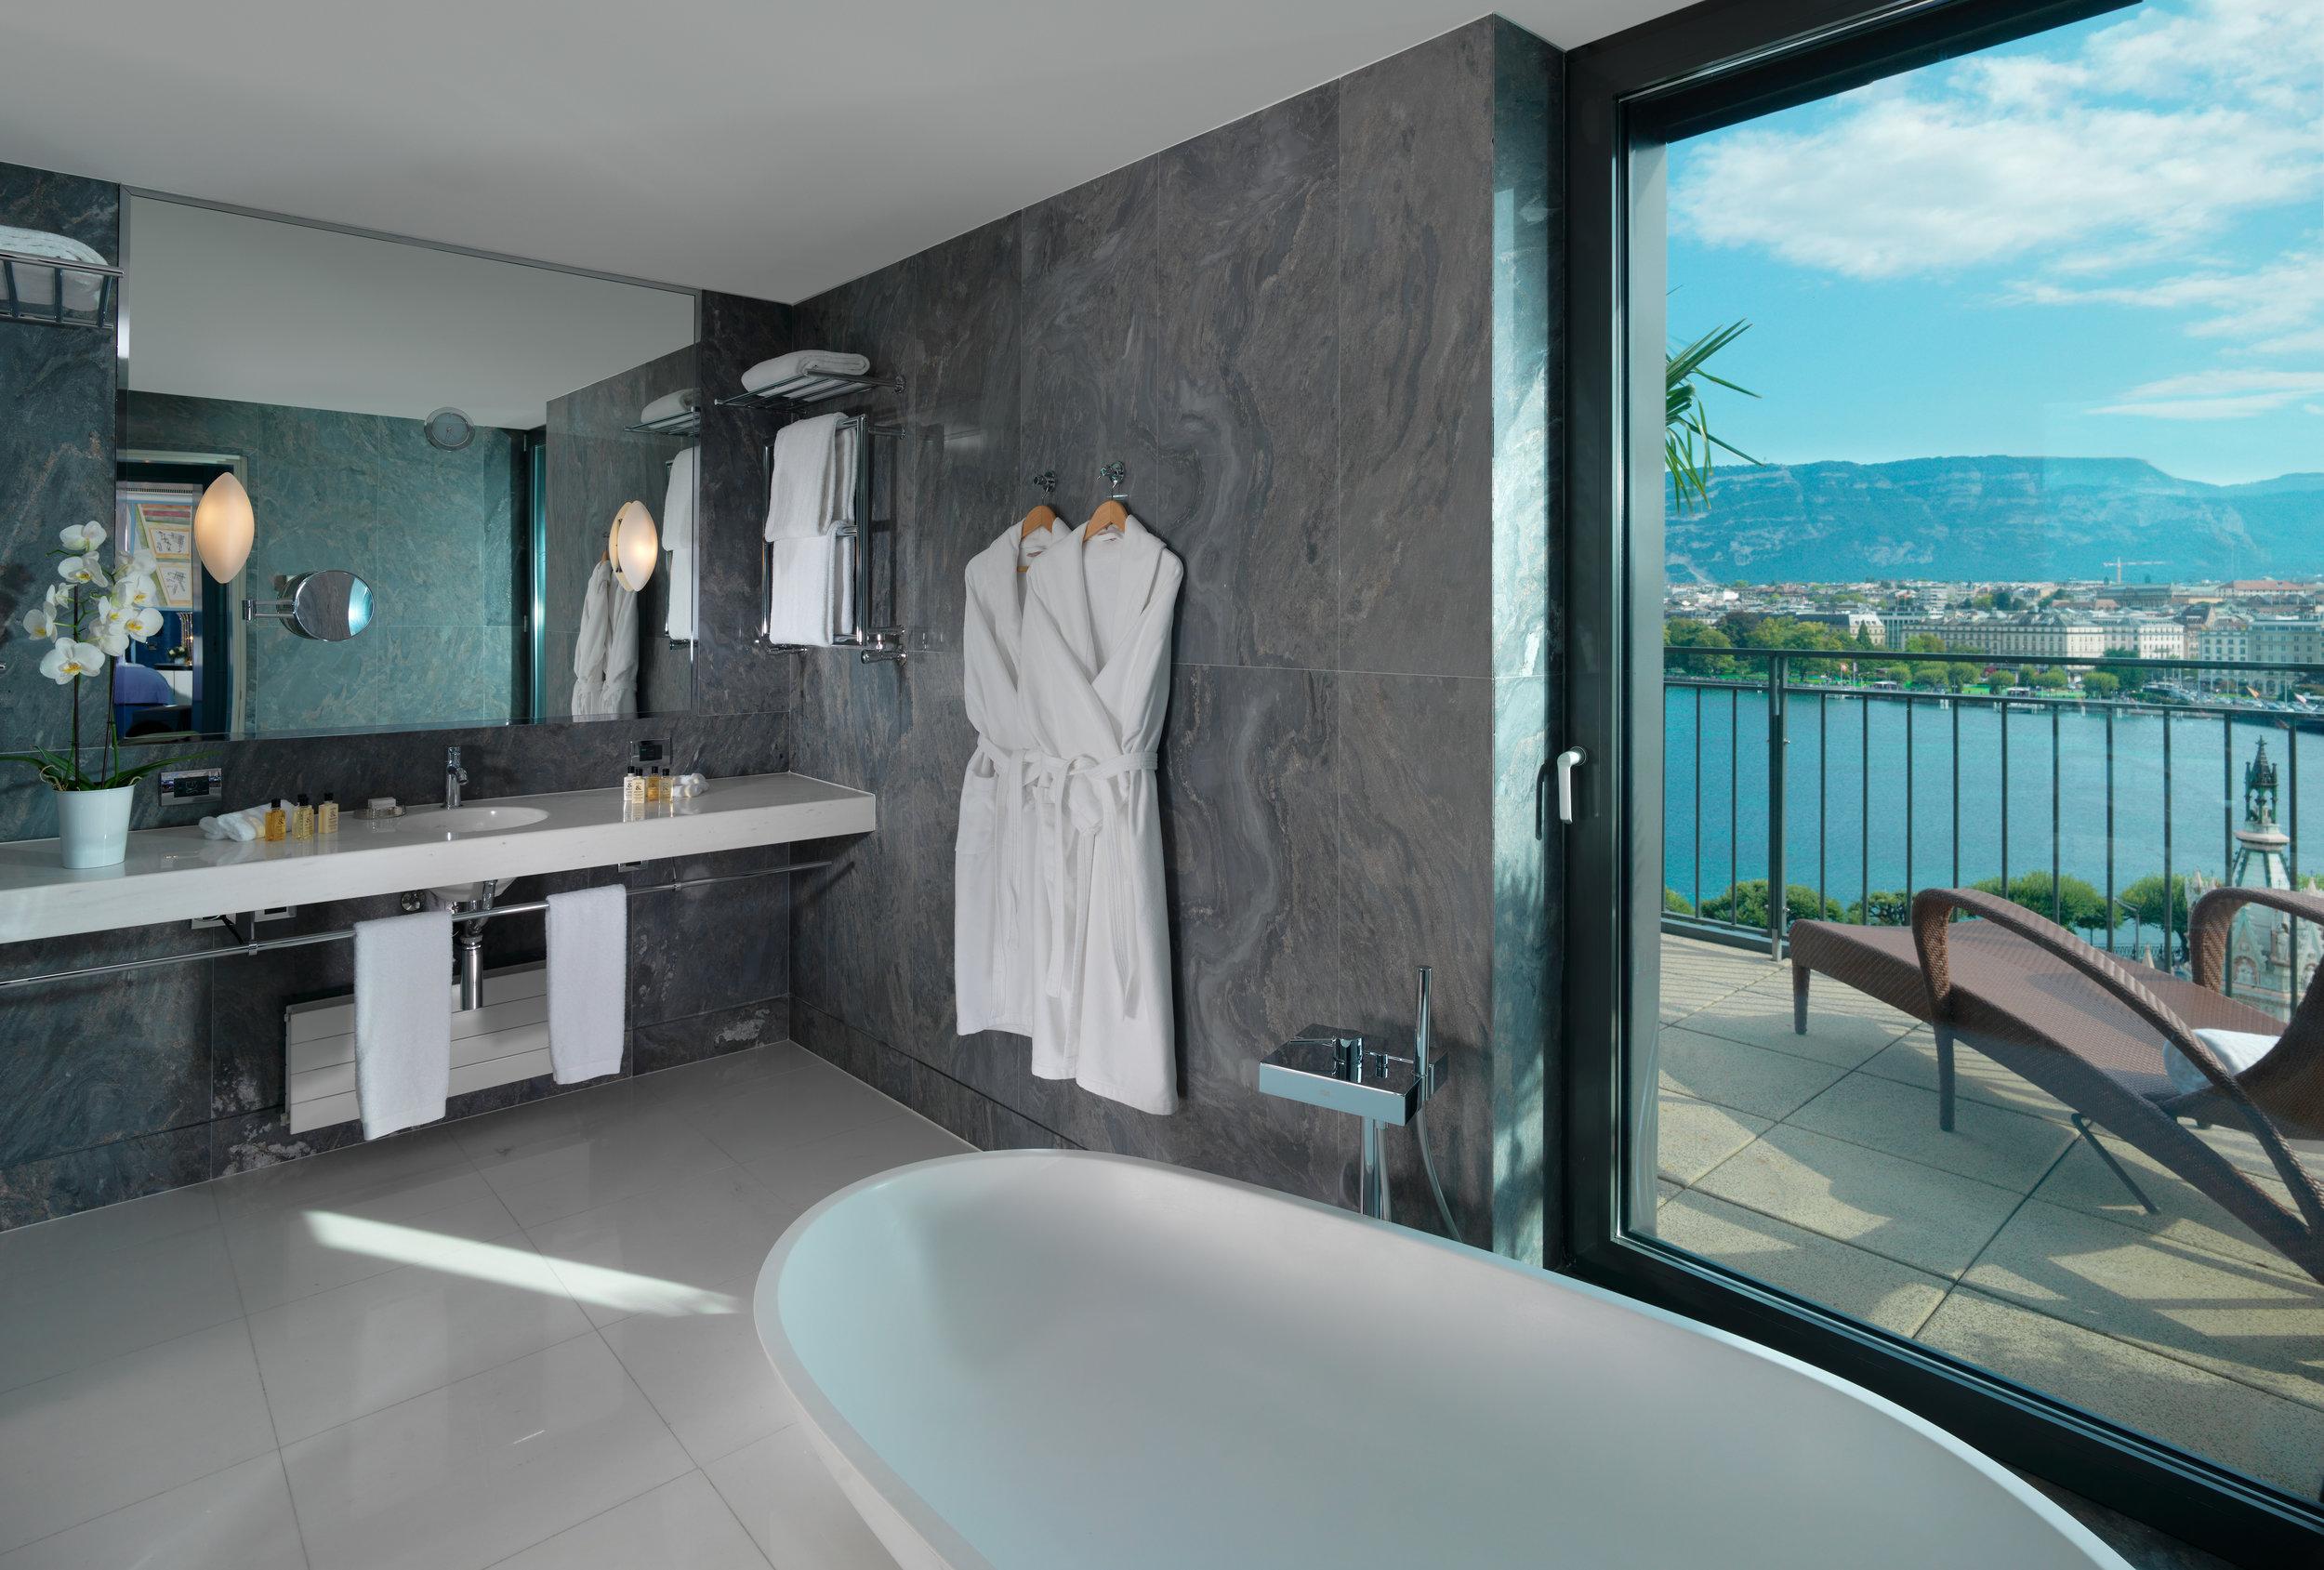 Le Richemond LRG_ Armleder Suite bathroom.jpg